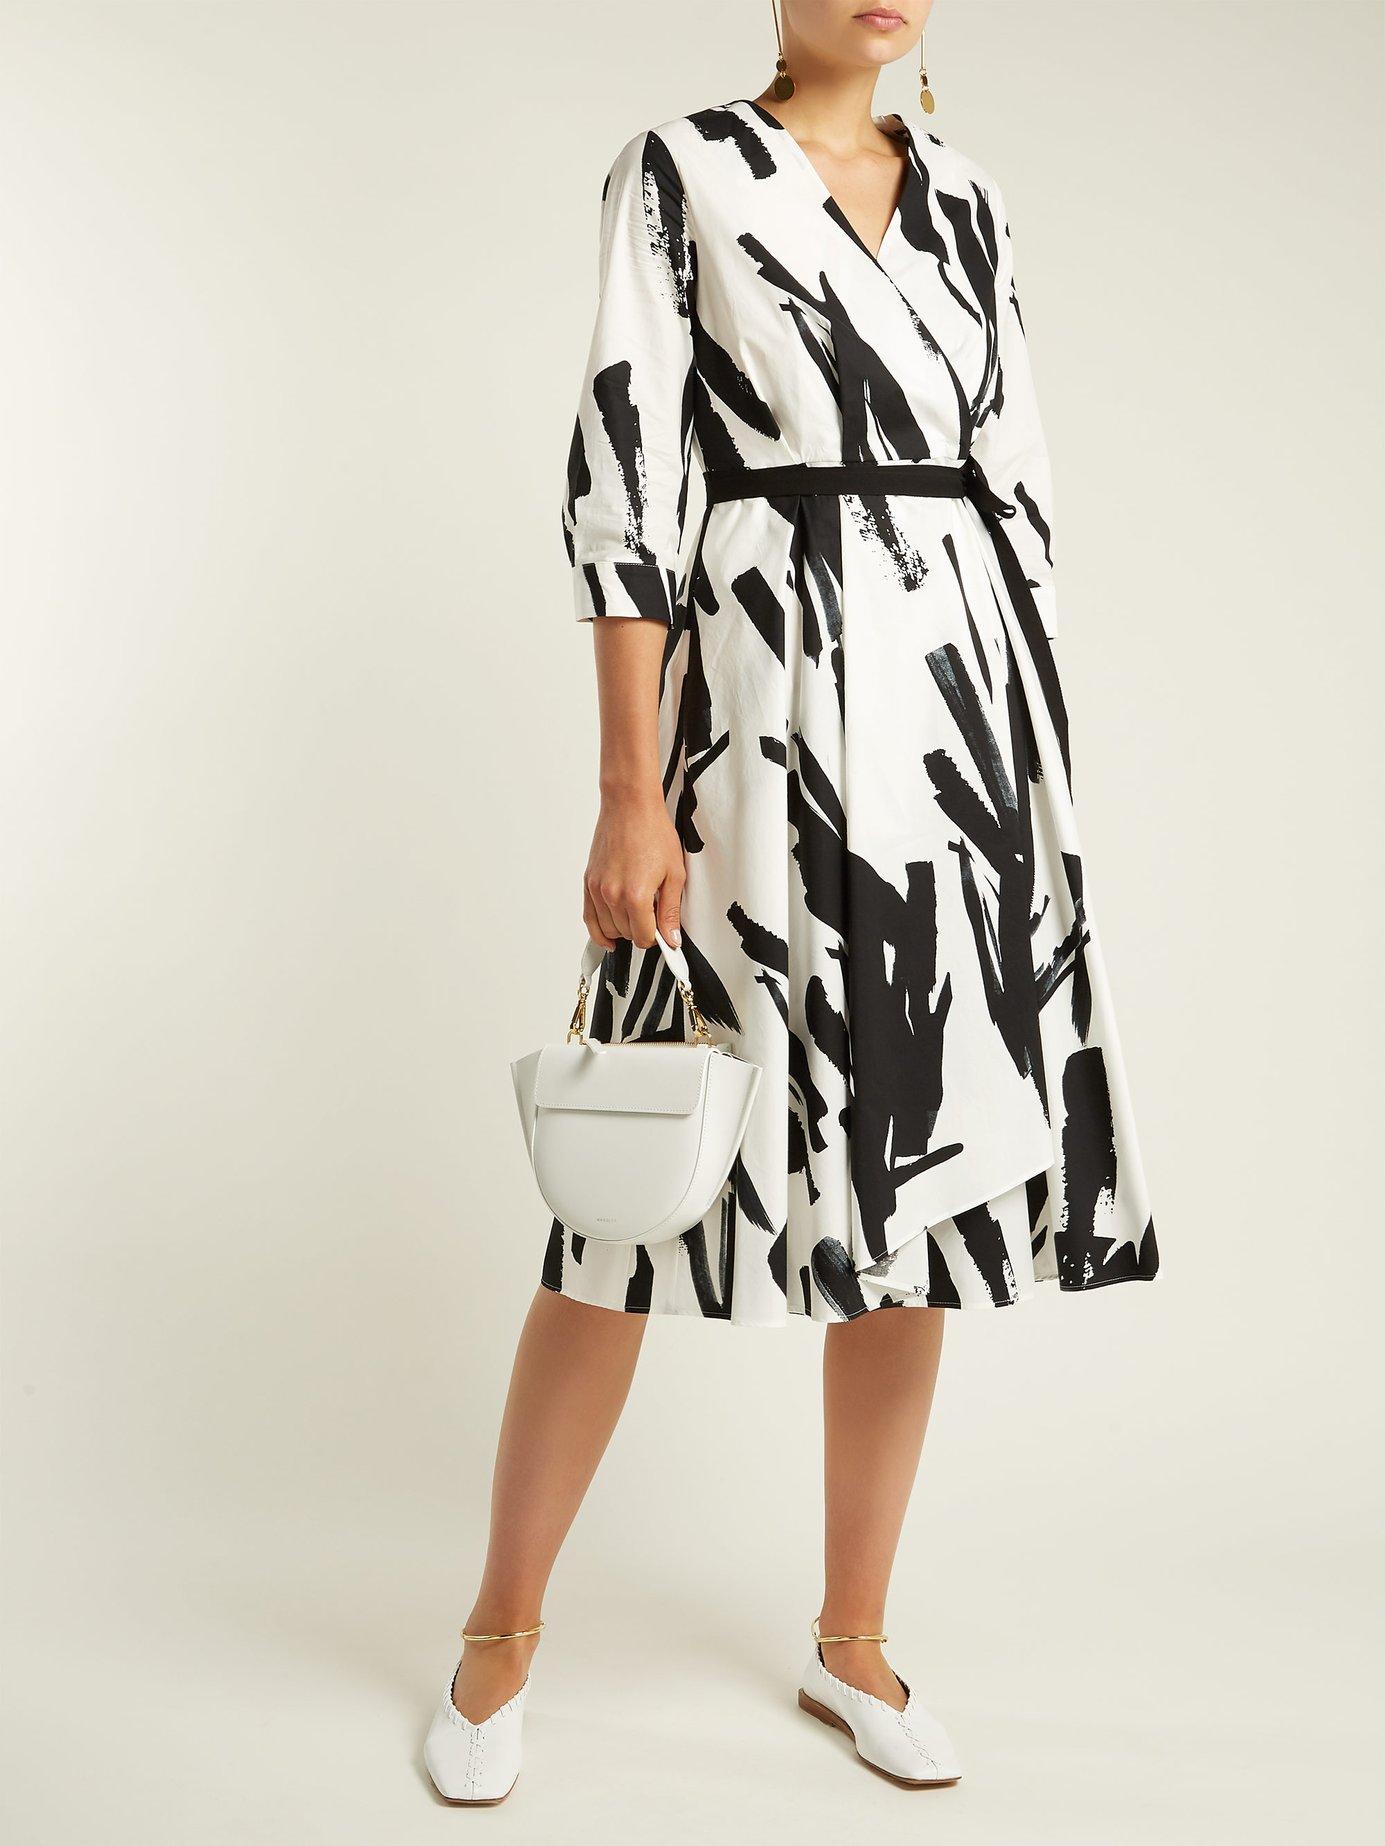 Cartone dress by Weekend Max Mara